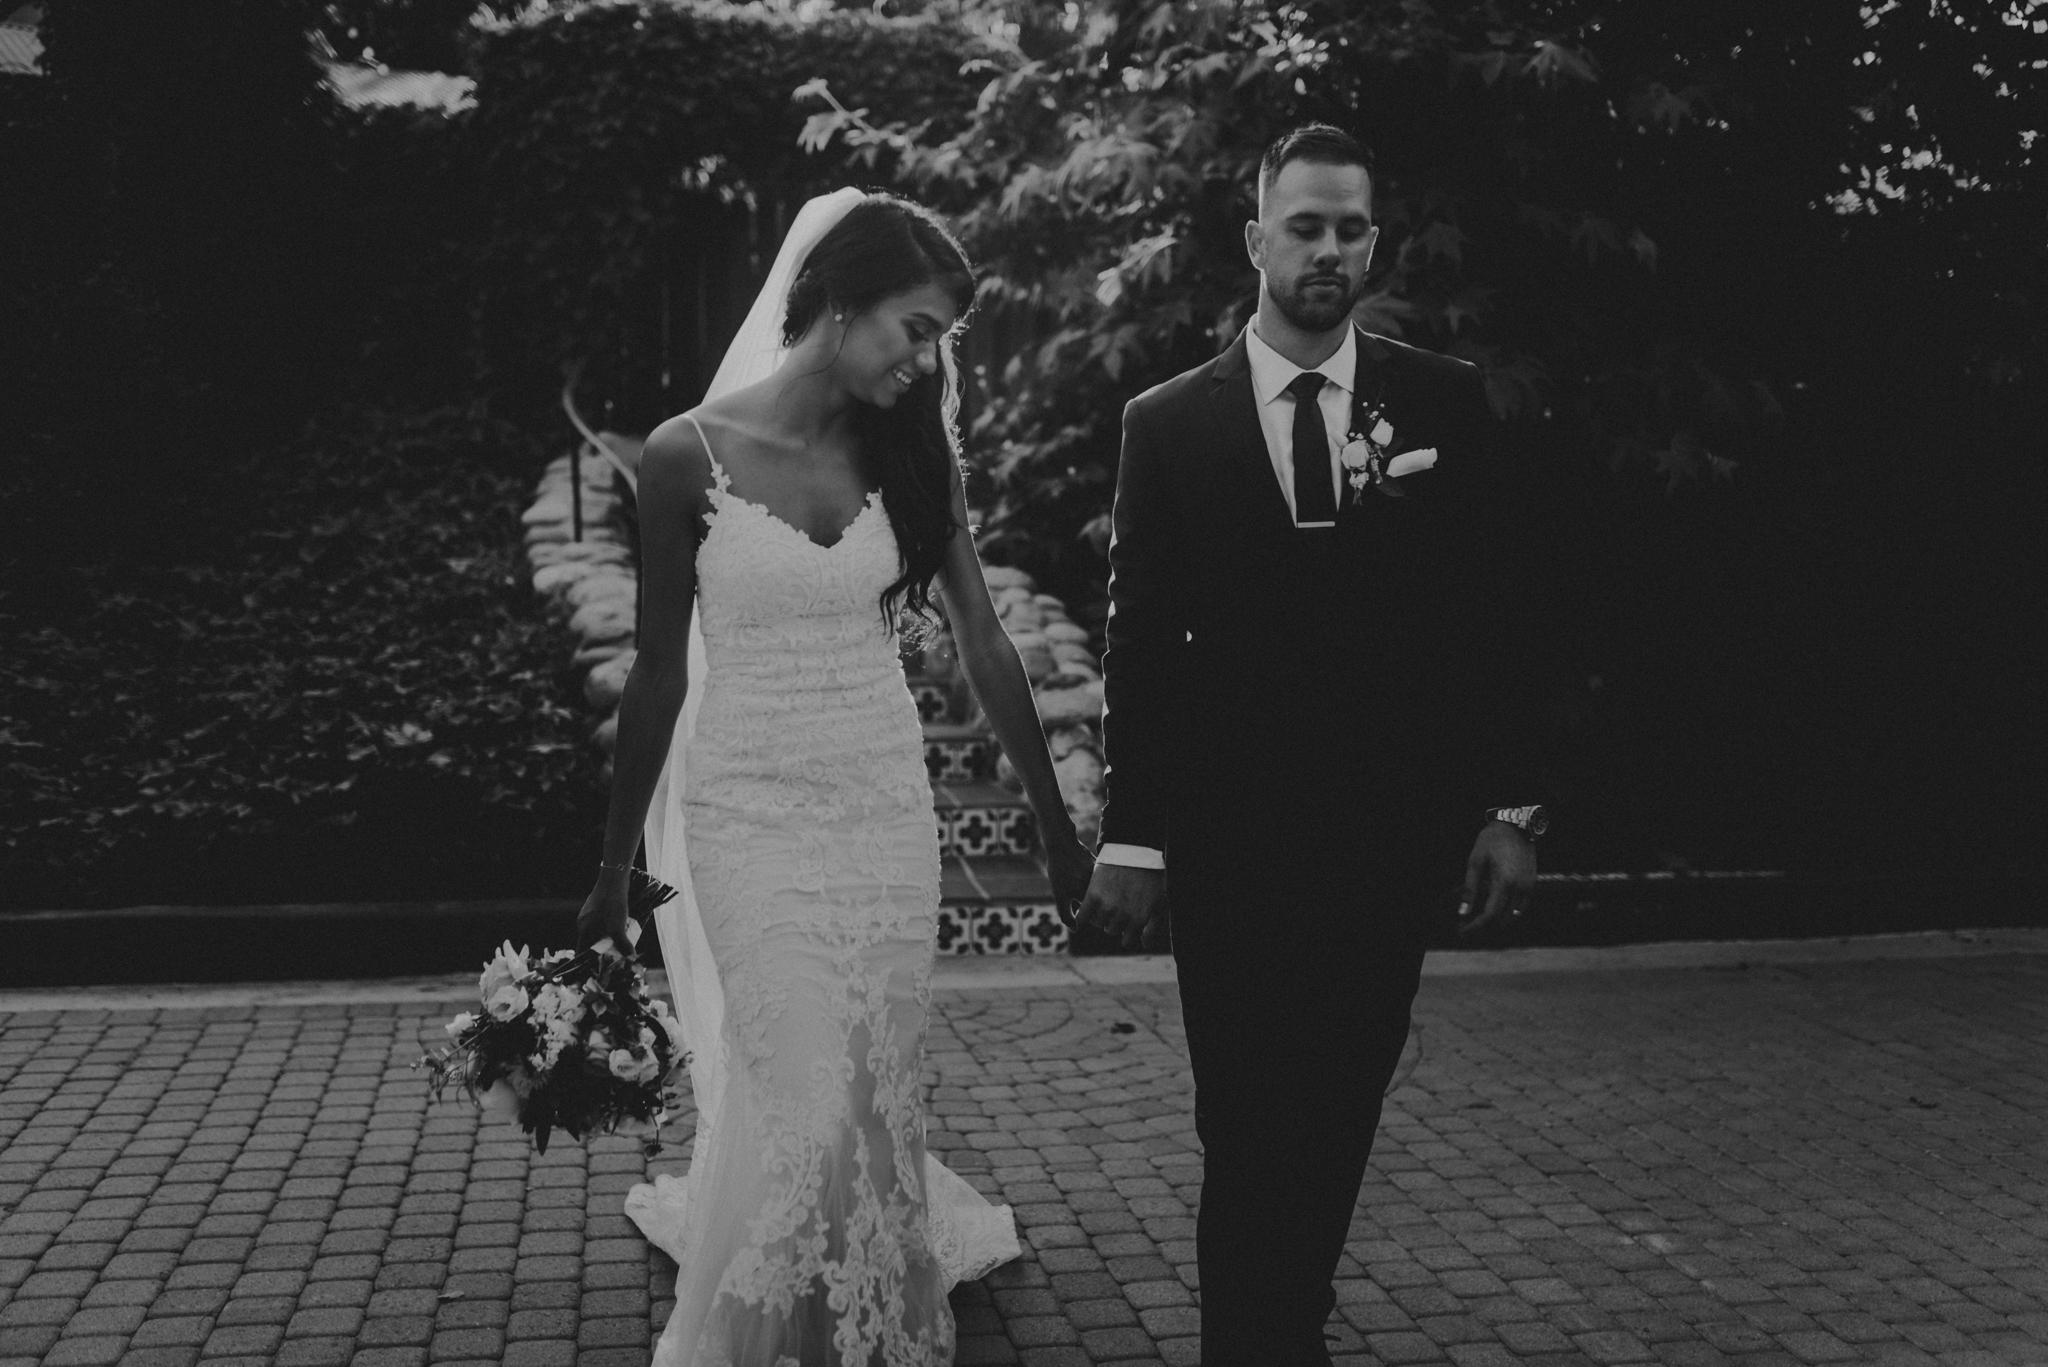 Isaiah + Taylor Photography - Rancho Las Lomas Wedding, Los Angeles Wedding Photographer-122.jpg